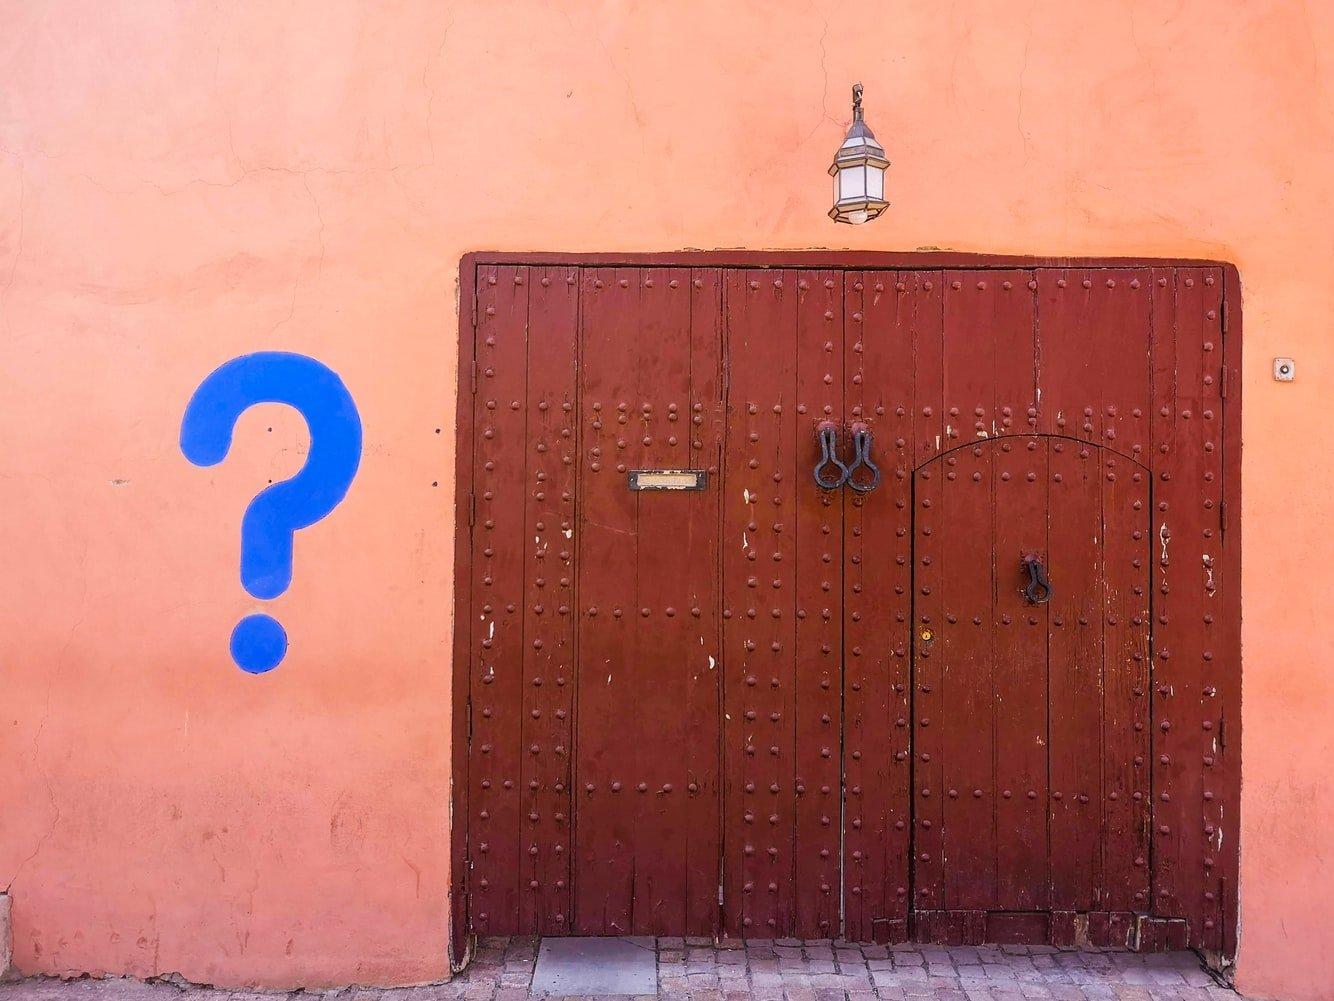 Question mark by doorway